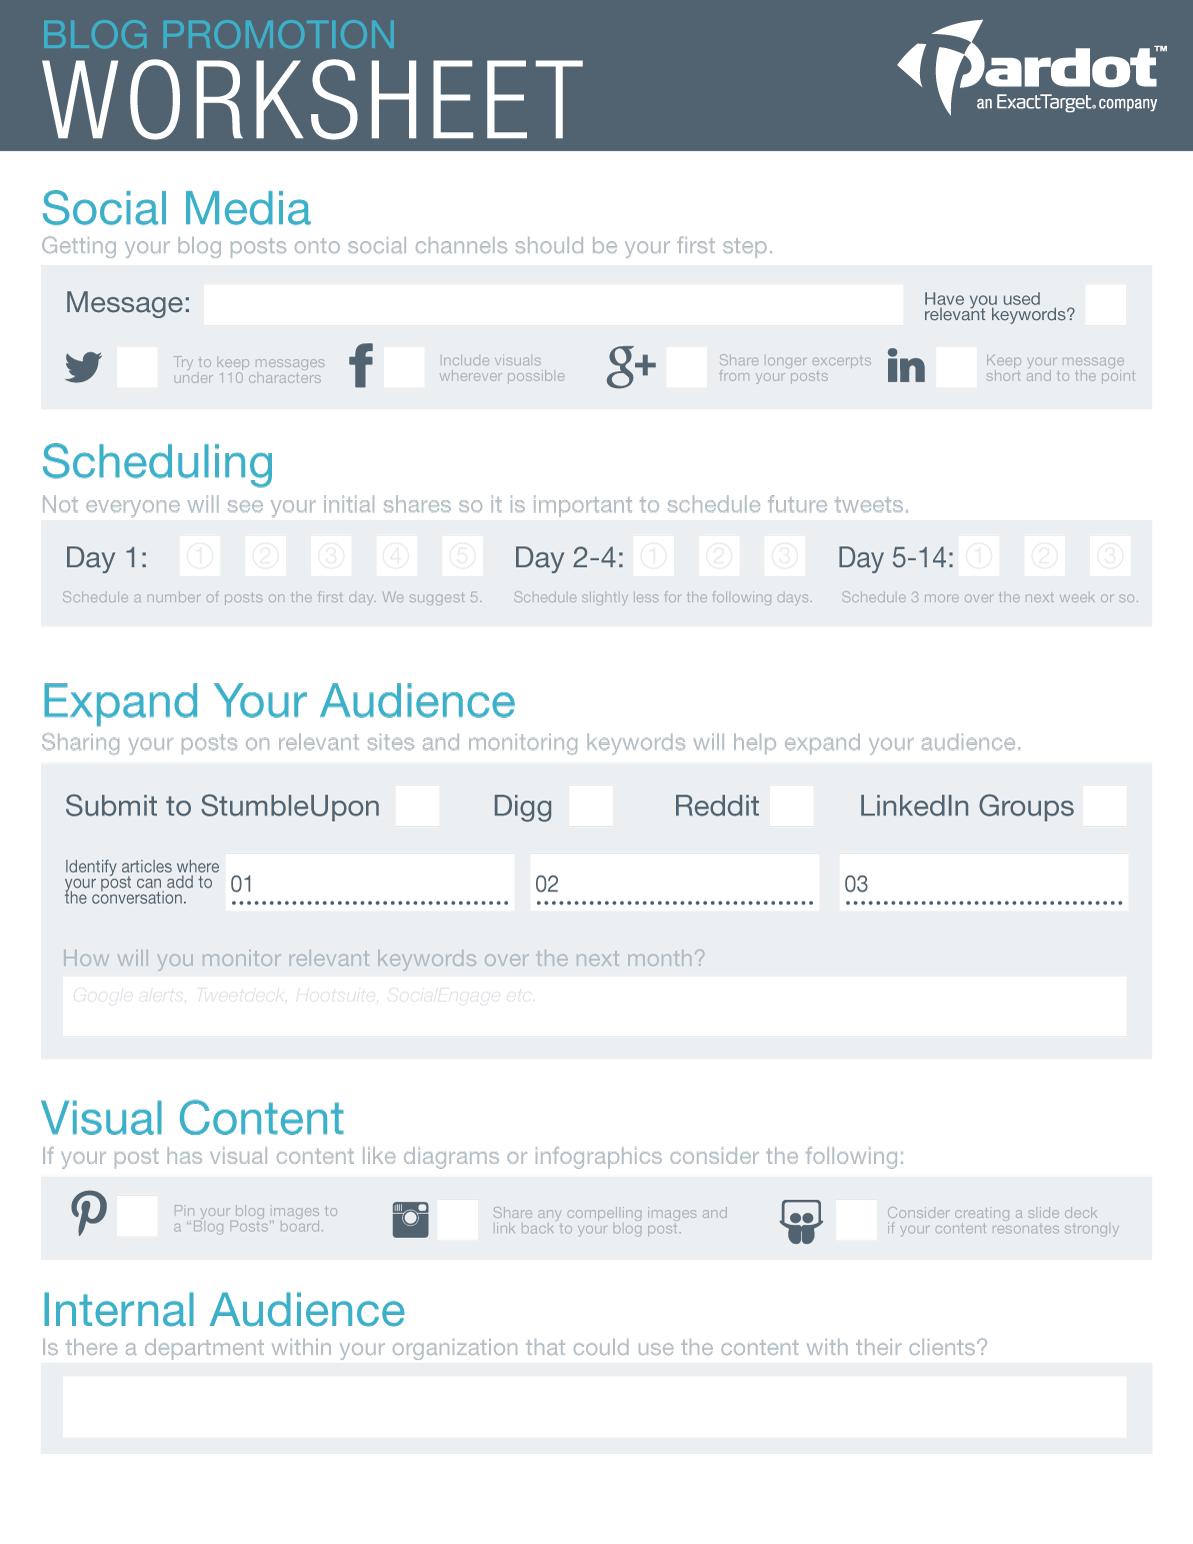 Worksheets Promotion Worksheet blog promotion worksheet you can publish incredible content but no